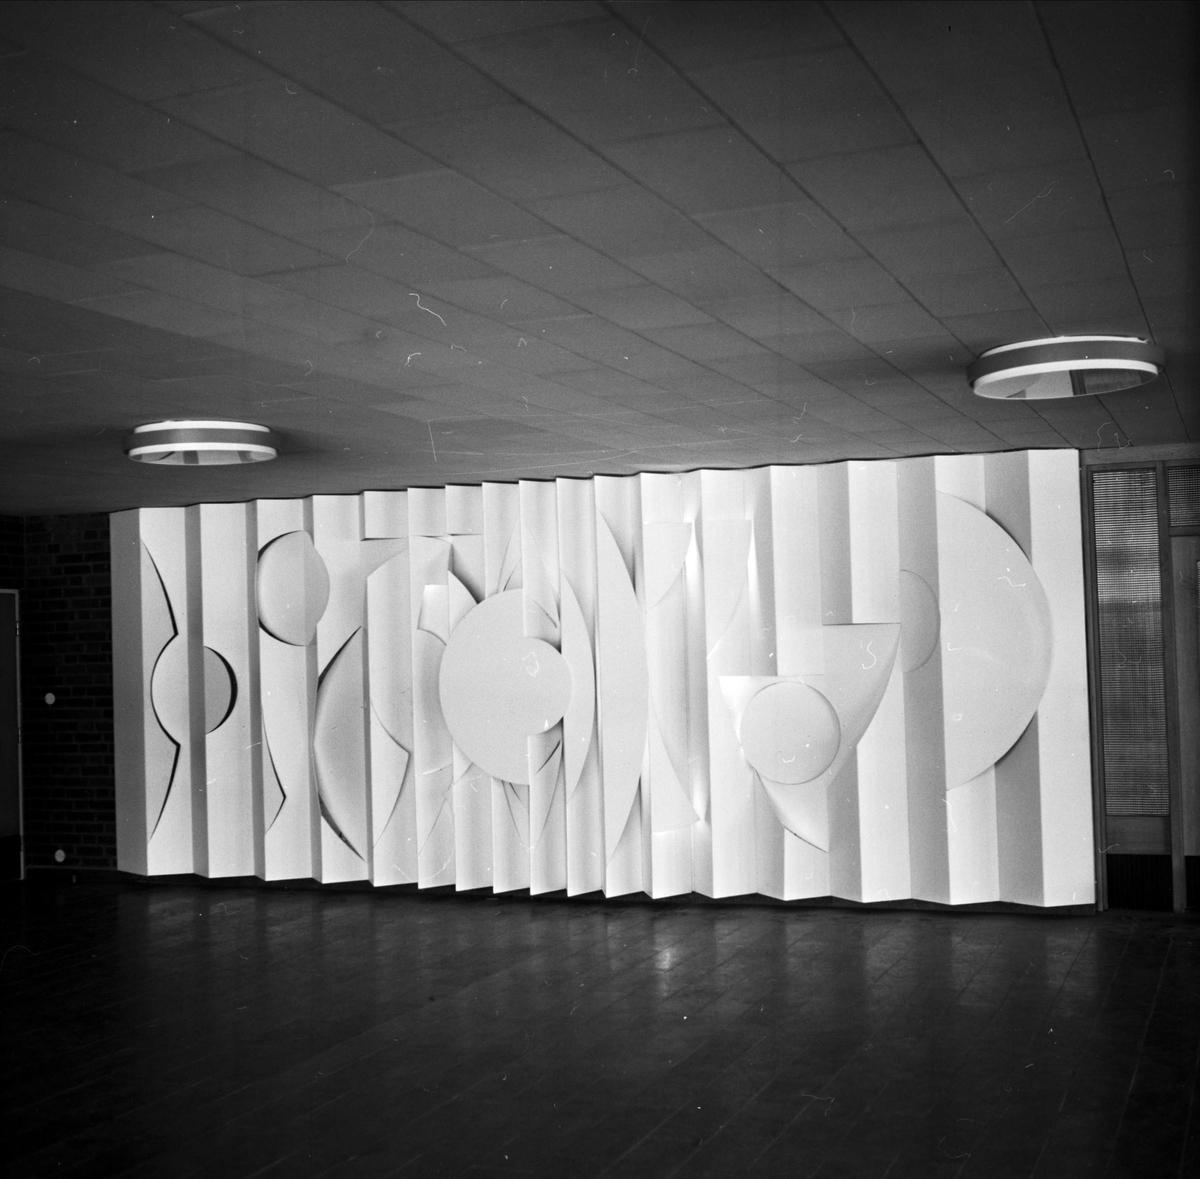 Konstnären Staffan Östlunds konstverk i aula, Tierp, Uppland 1968